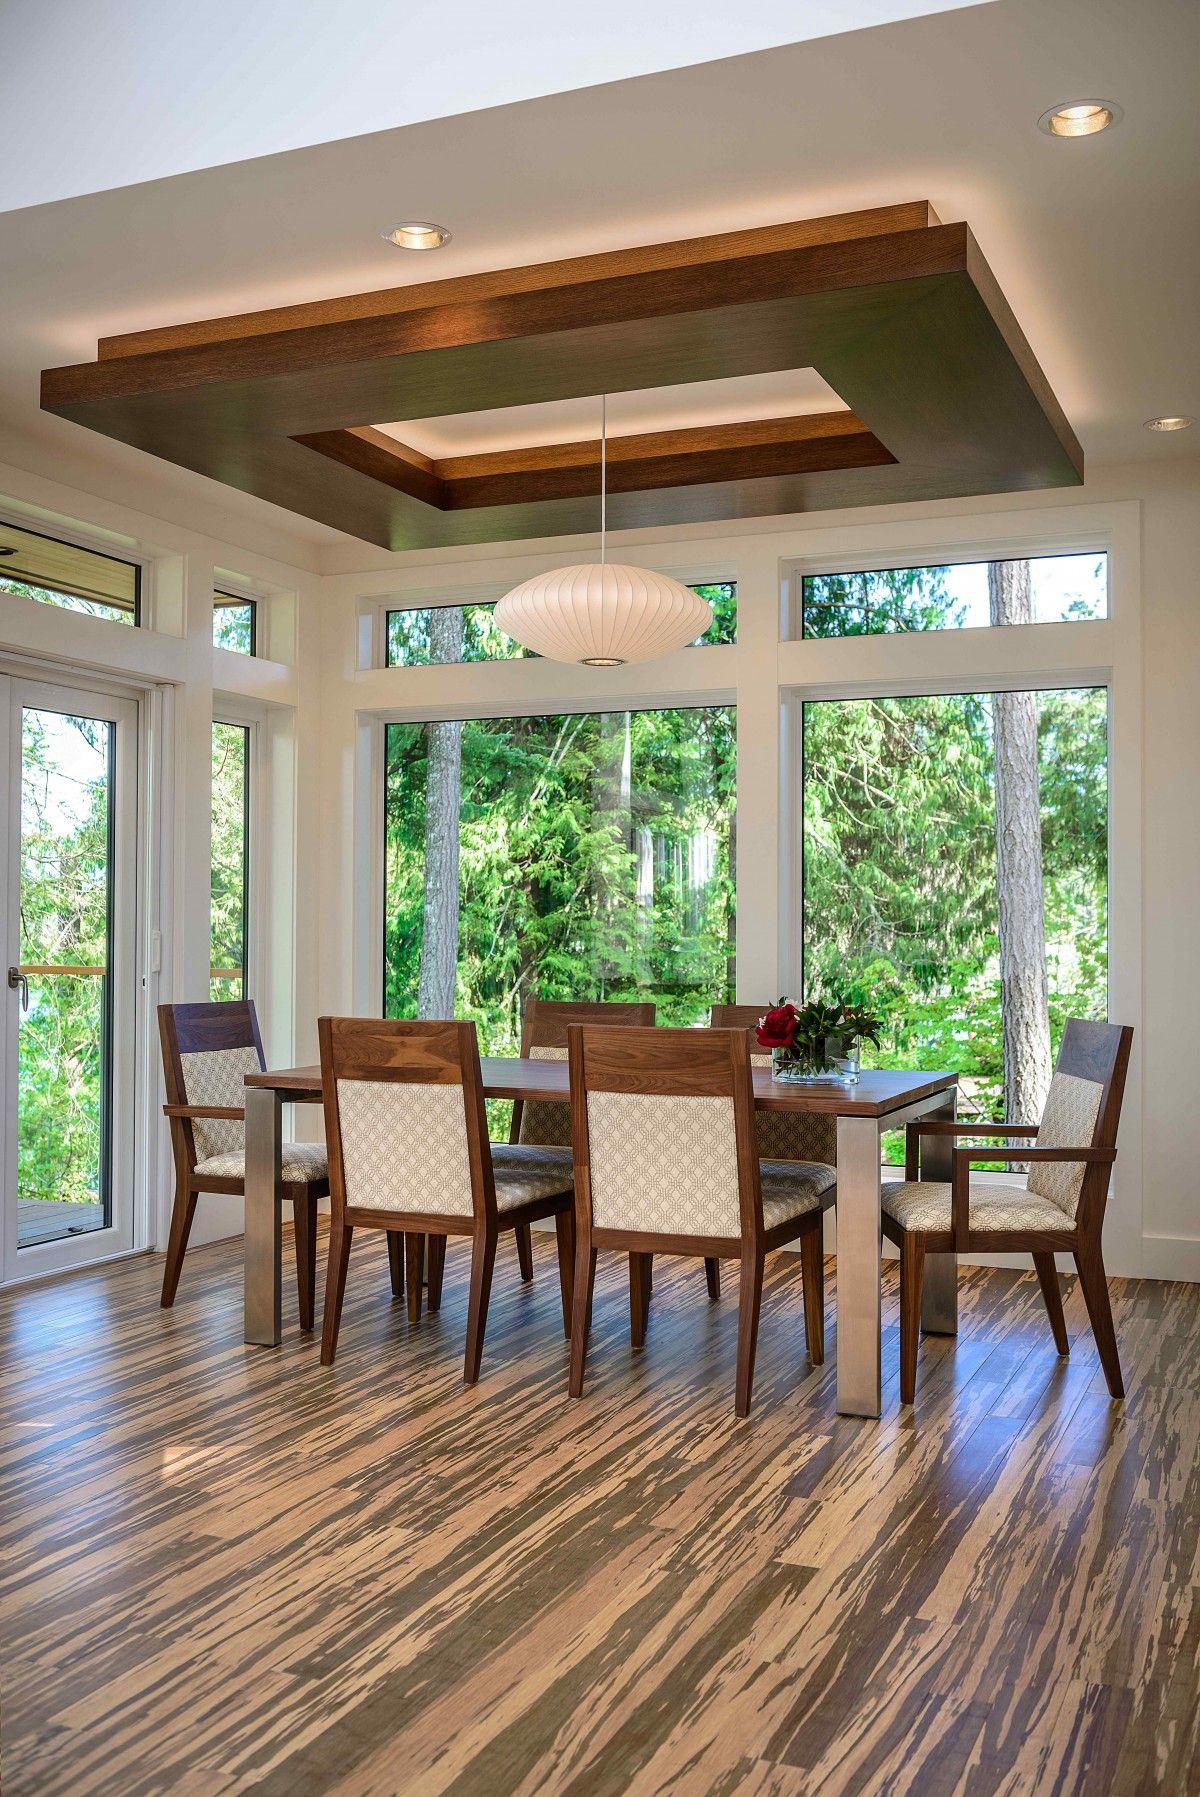 The inlet gypsum ceiling design kitchen house modern also image result for wooden false rh pinterest